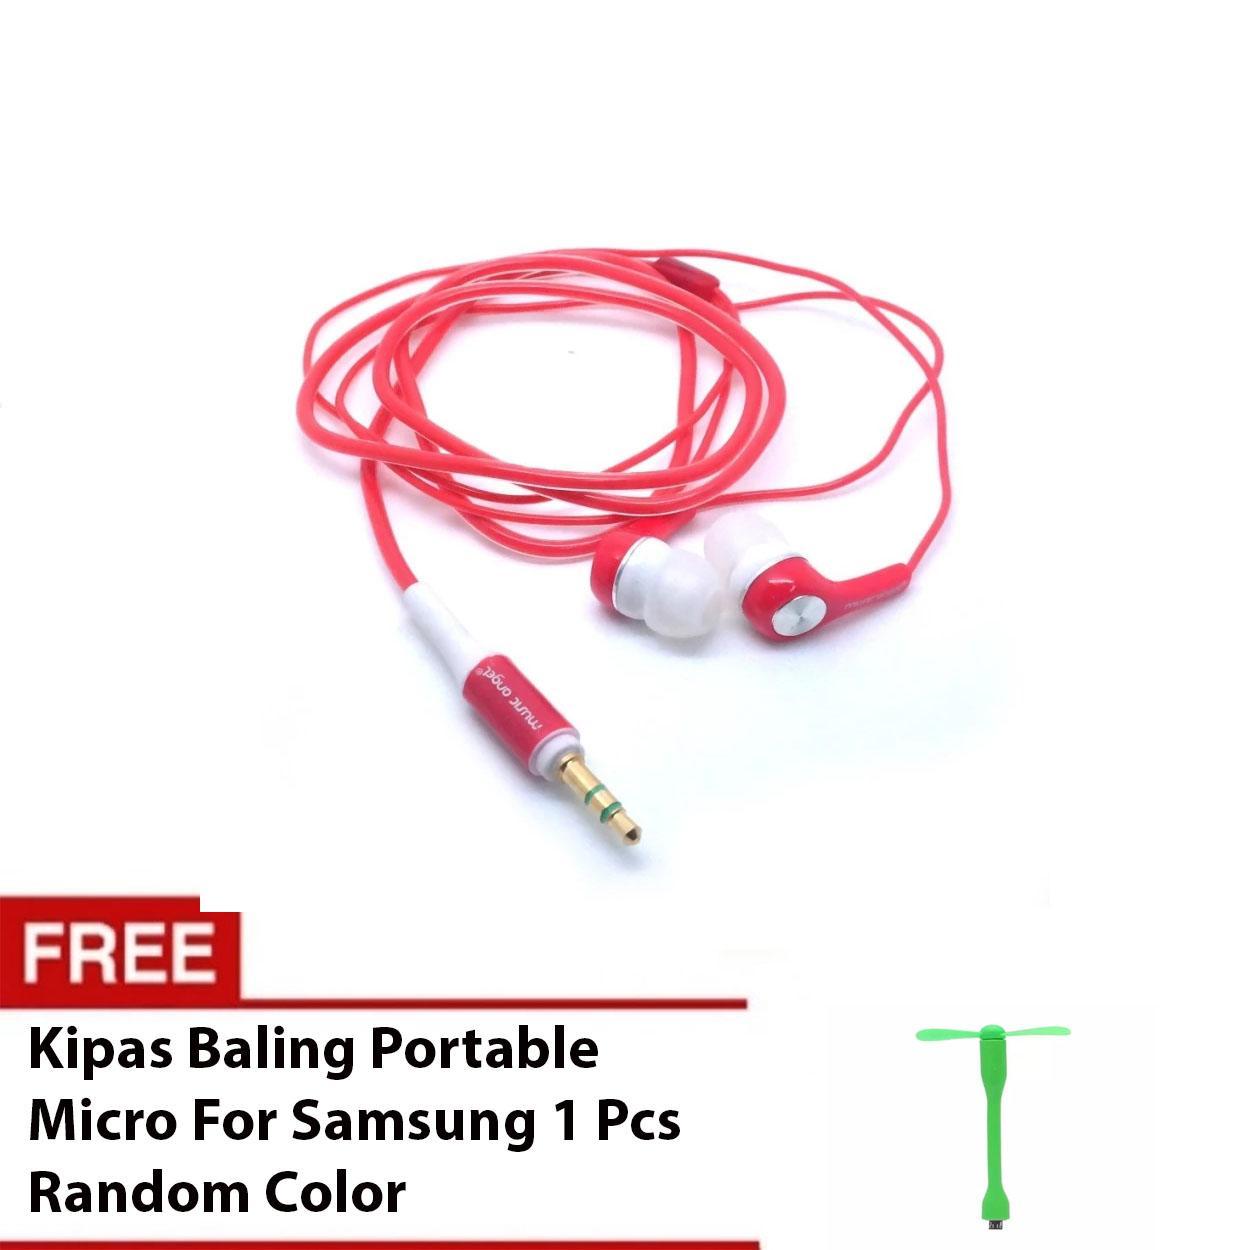 Angel Micro Mini Fan Kipas Angin Baling Portable Colokan Isi 2 Hp V8 Harga Music Earphone Ma222 Bundling For Samsung Random Hargaloka